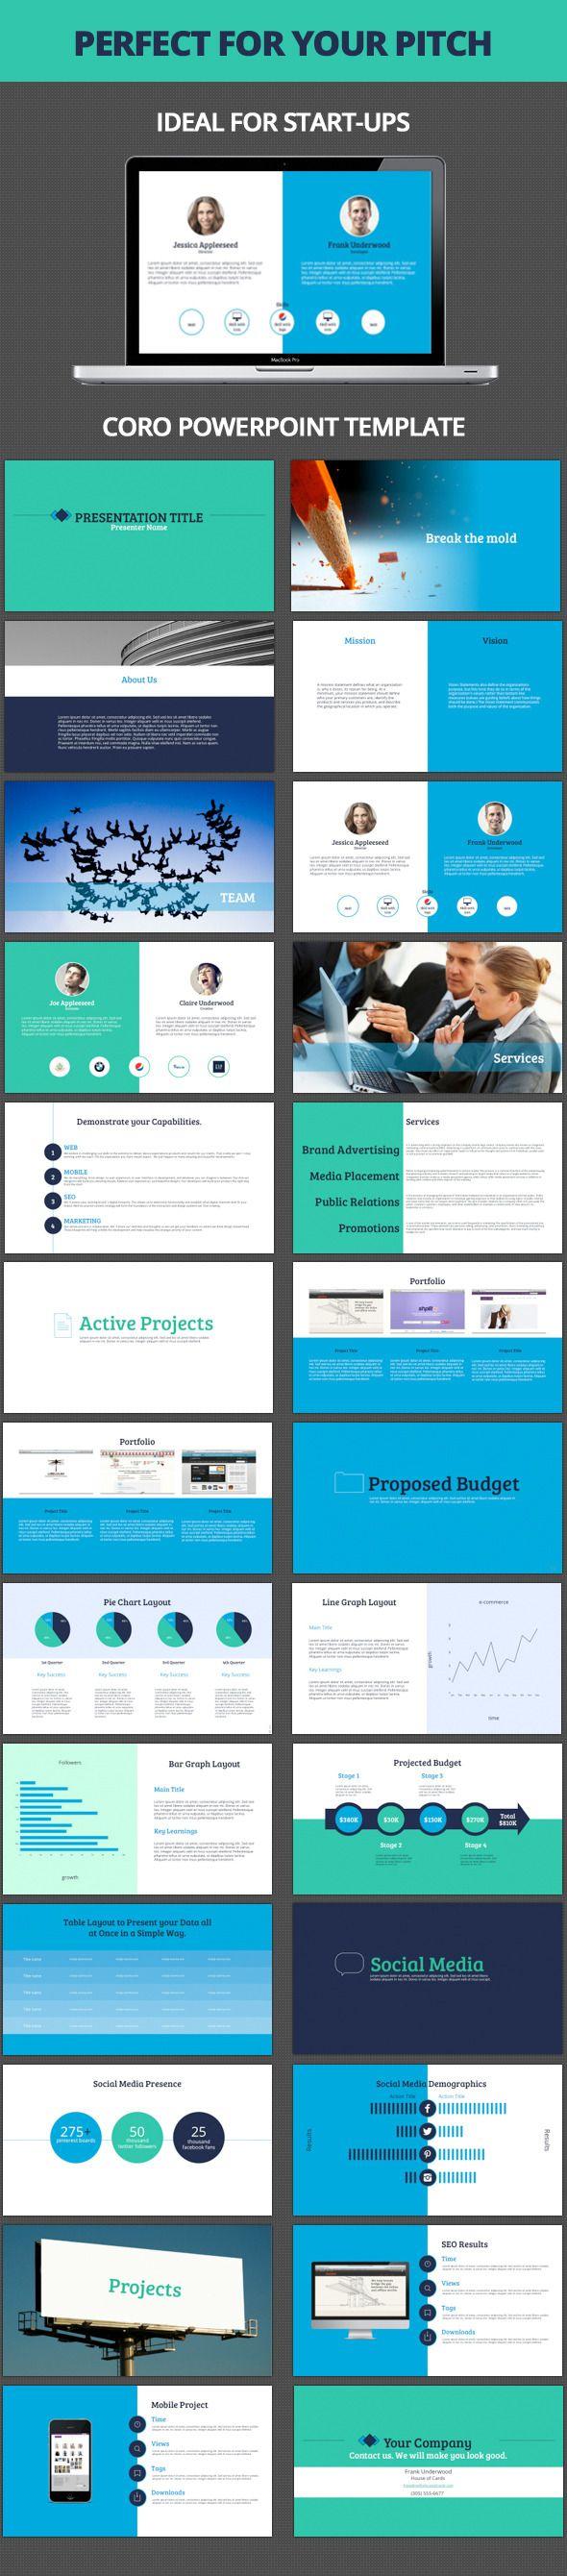 Coro Powerpoint Template - Presentation Templates